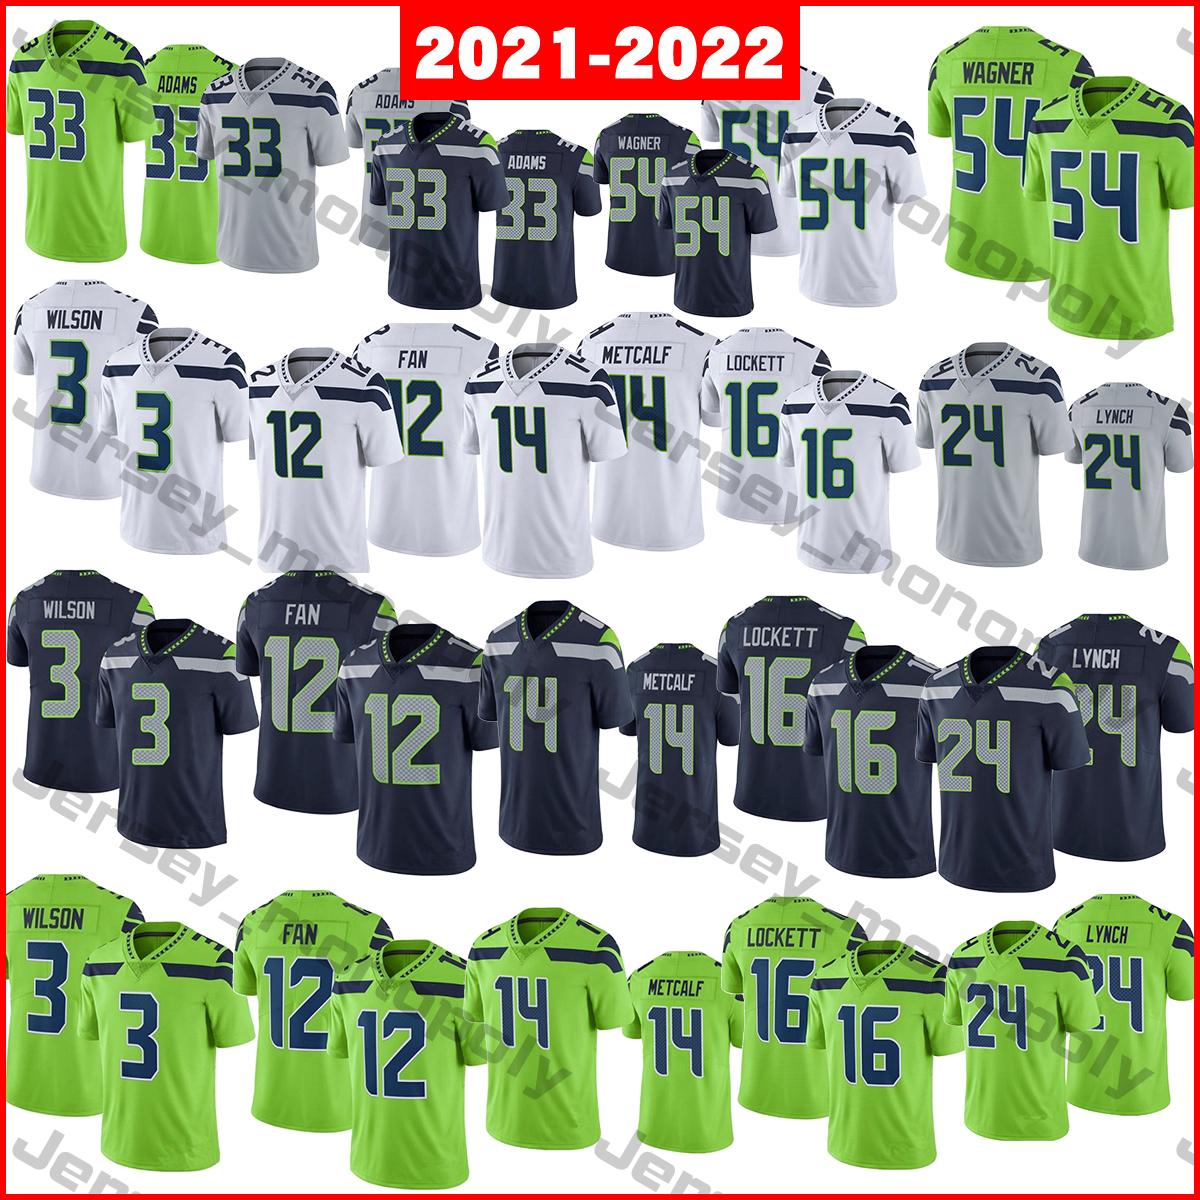 2021-2022 Football Jerseys 3 Russell Wilsonn 12 Fan 14 DK Metcalf 16 Tyler Lockett 24 Marshawn Lynch 33 Jamal Adams 54 Bobby Wagner